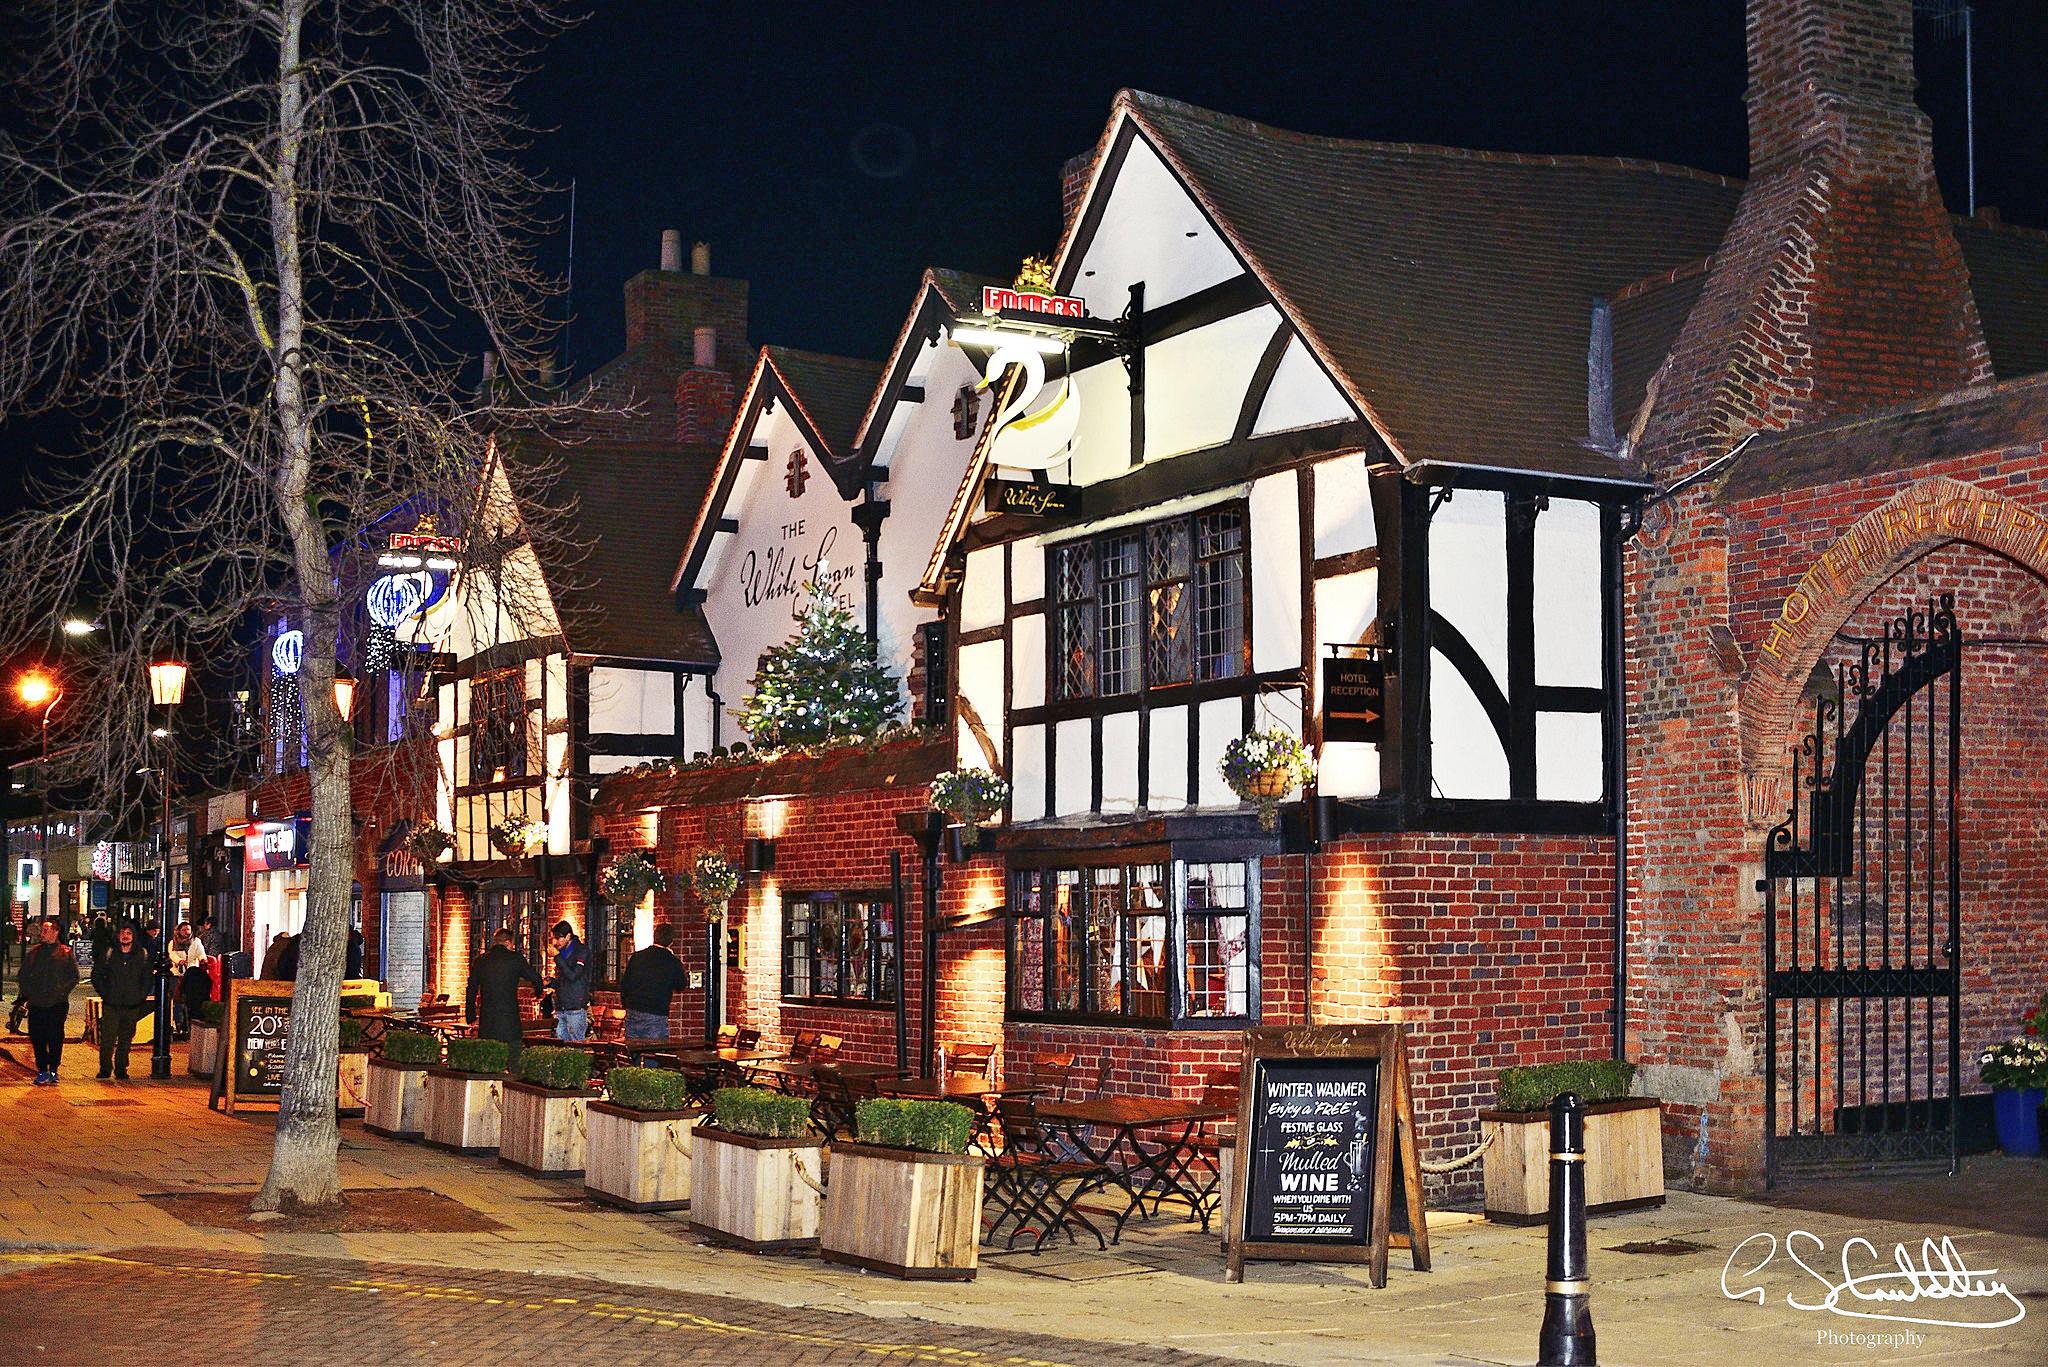 Stratford-Upon-Avon, Warwickshire by Gary S Crutchley.jpg